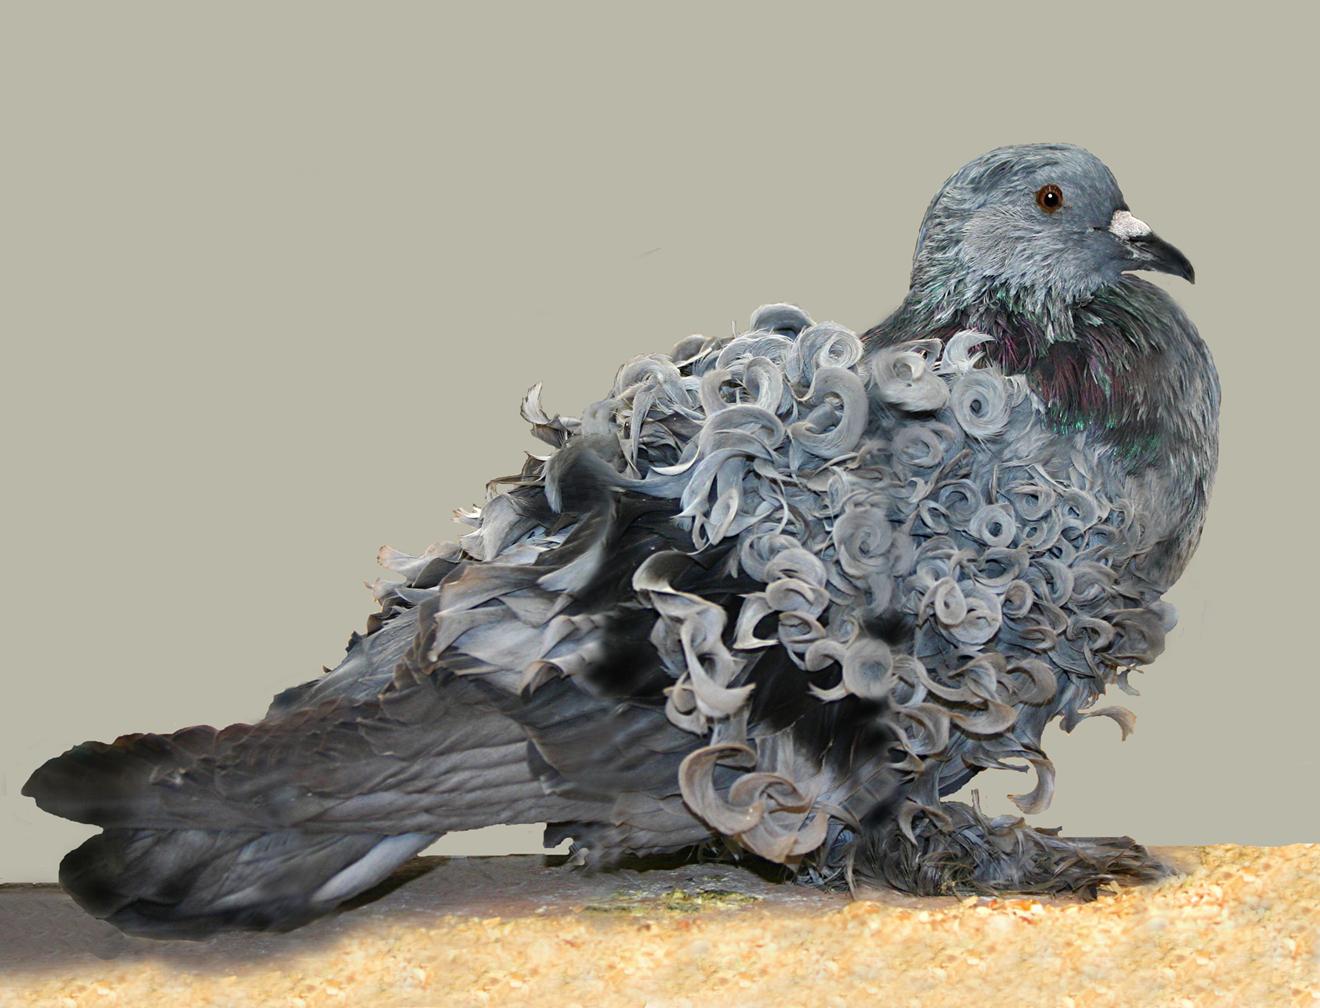 http://upload.wikimedia.org/wikipedia/commons/b/b4/Frillback_pigeon.jpg